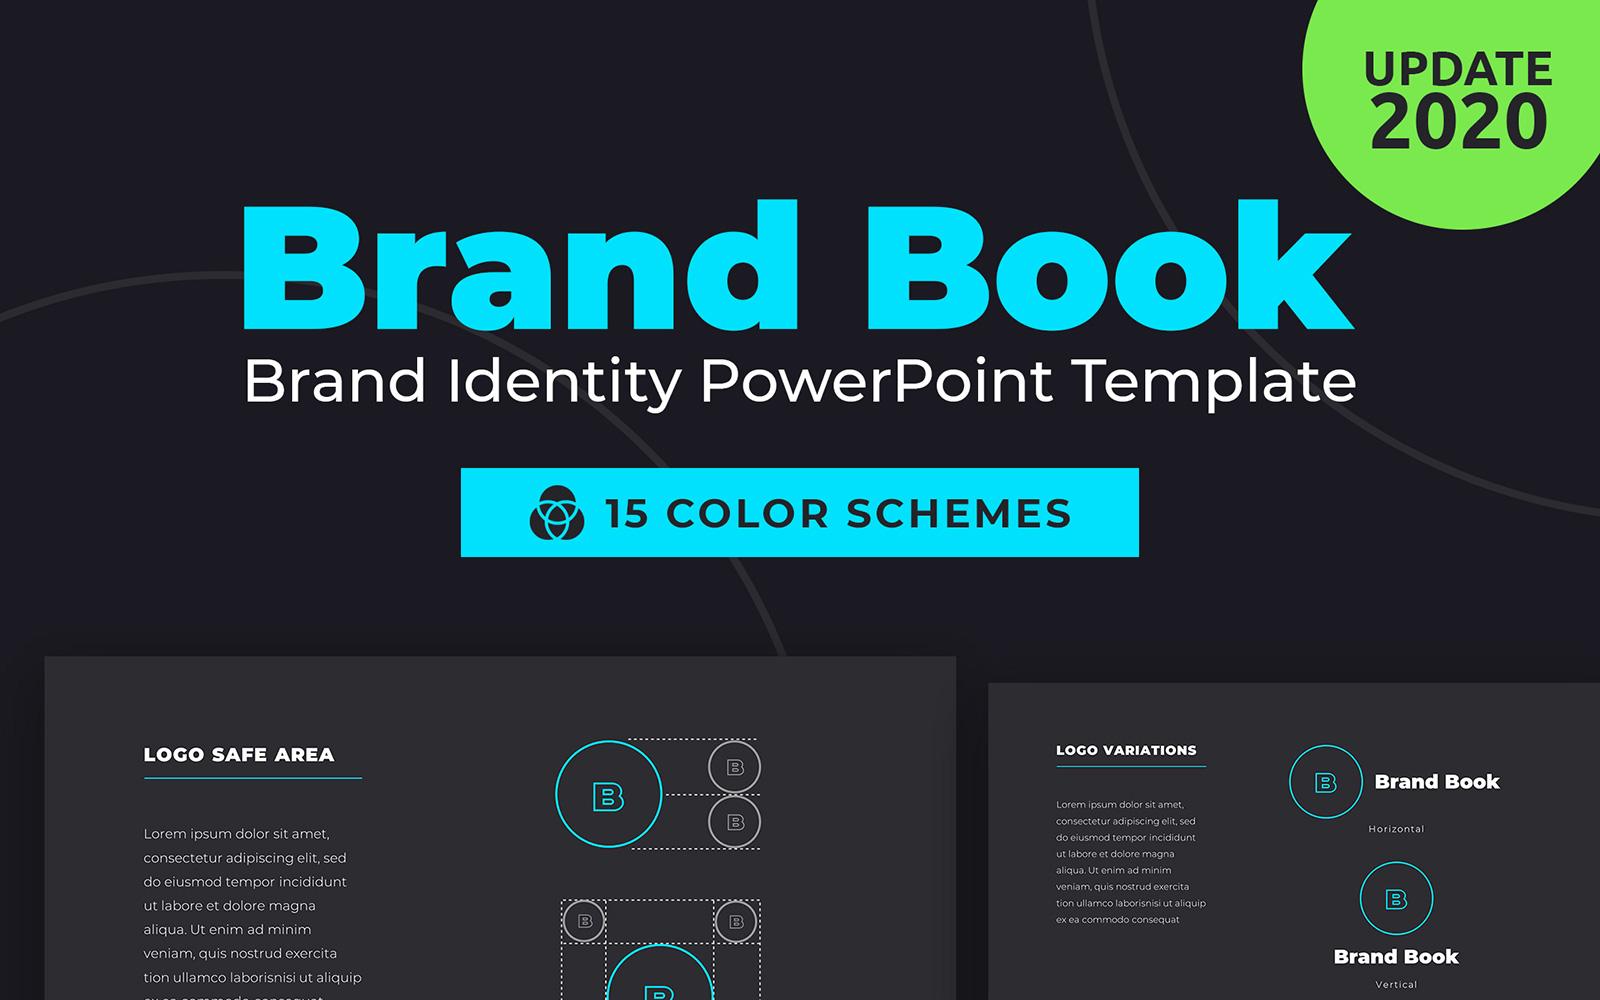 Szablon PowerPoint BrandBook Brand Identity #95509